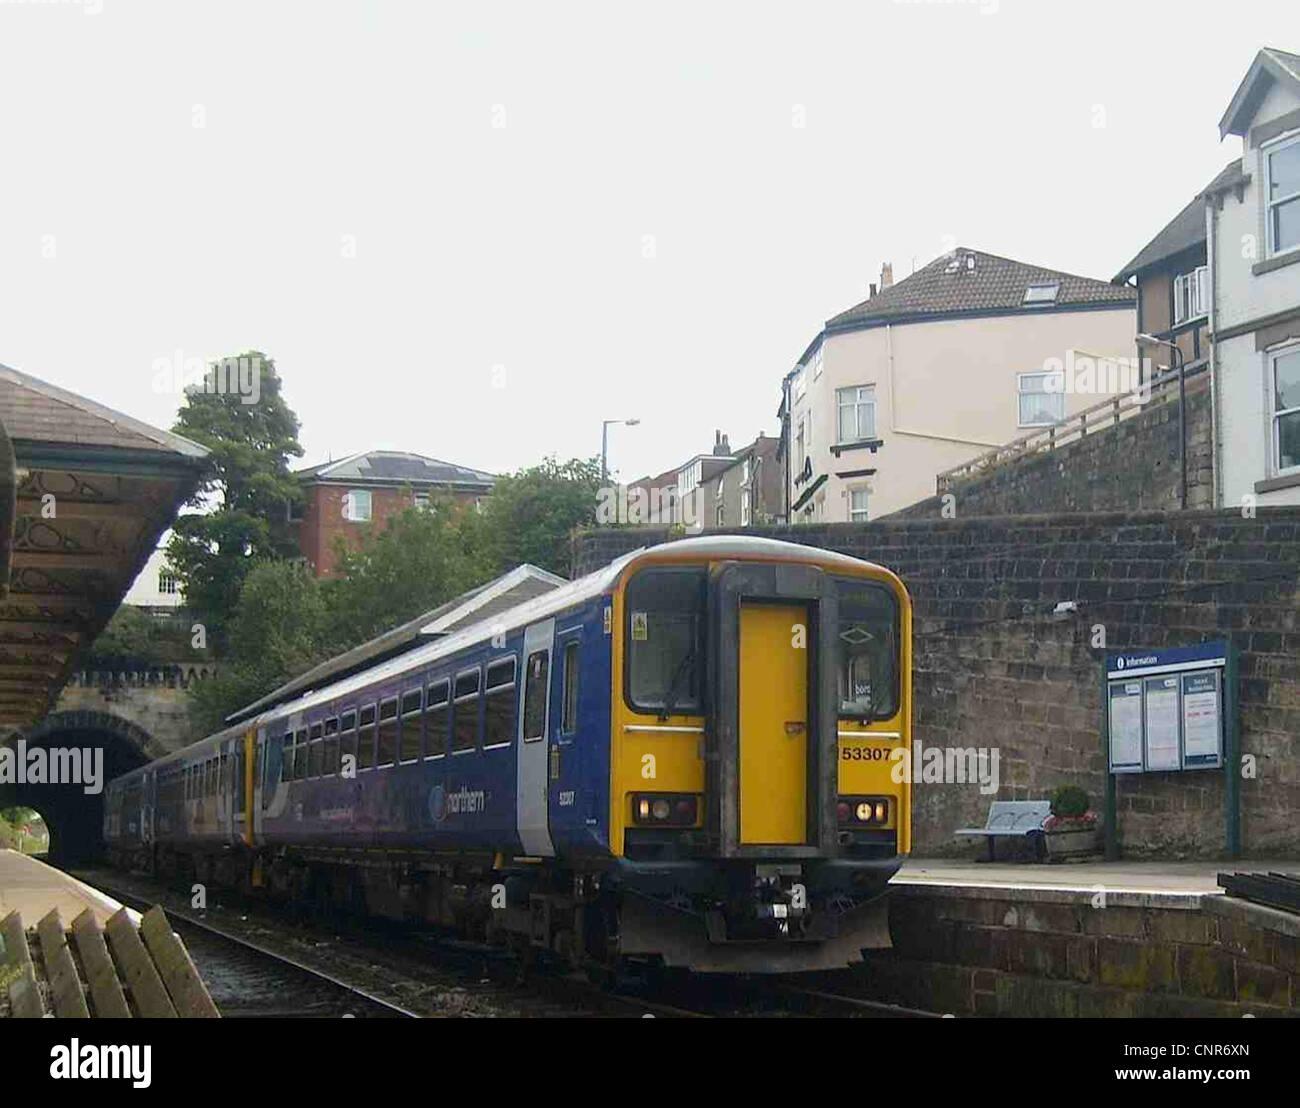 Northern Rail refurbished Class 153 No. 153307 is seen at Knaresborough, -  Stock Image